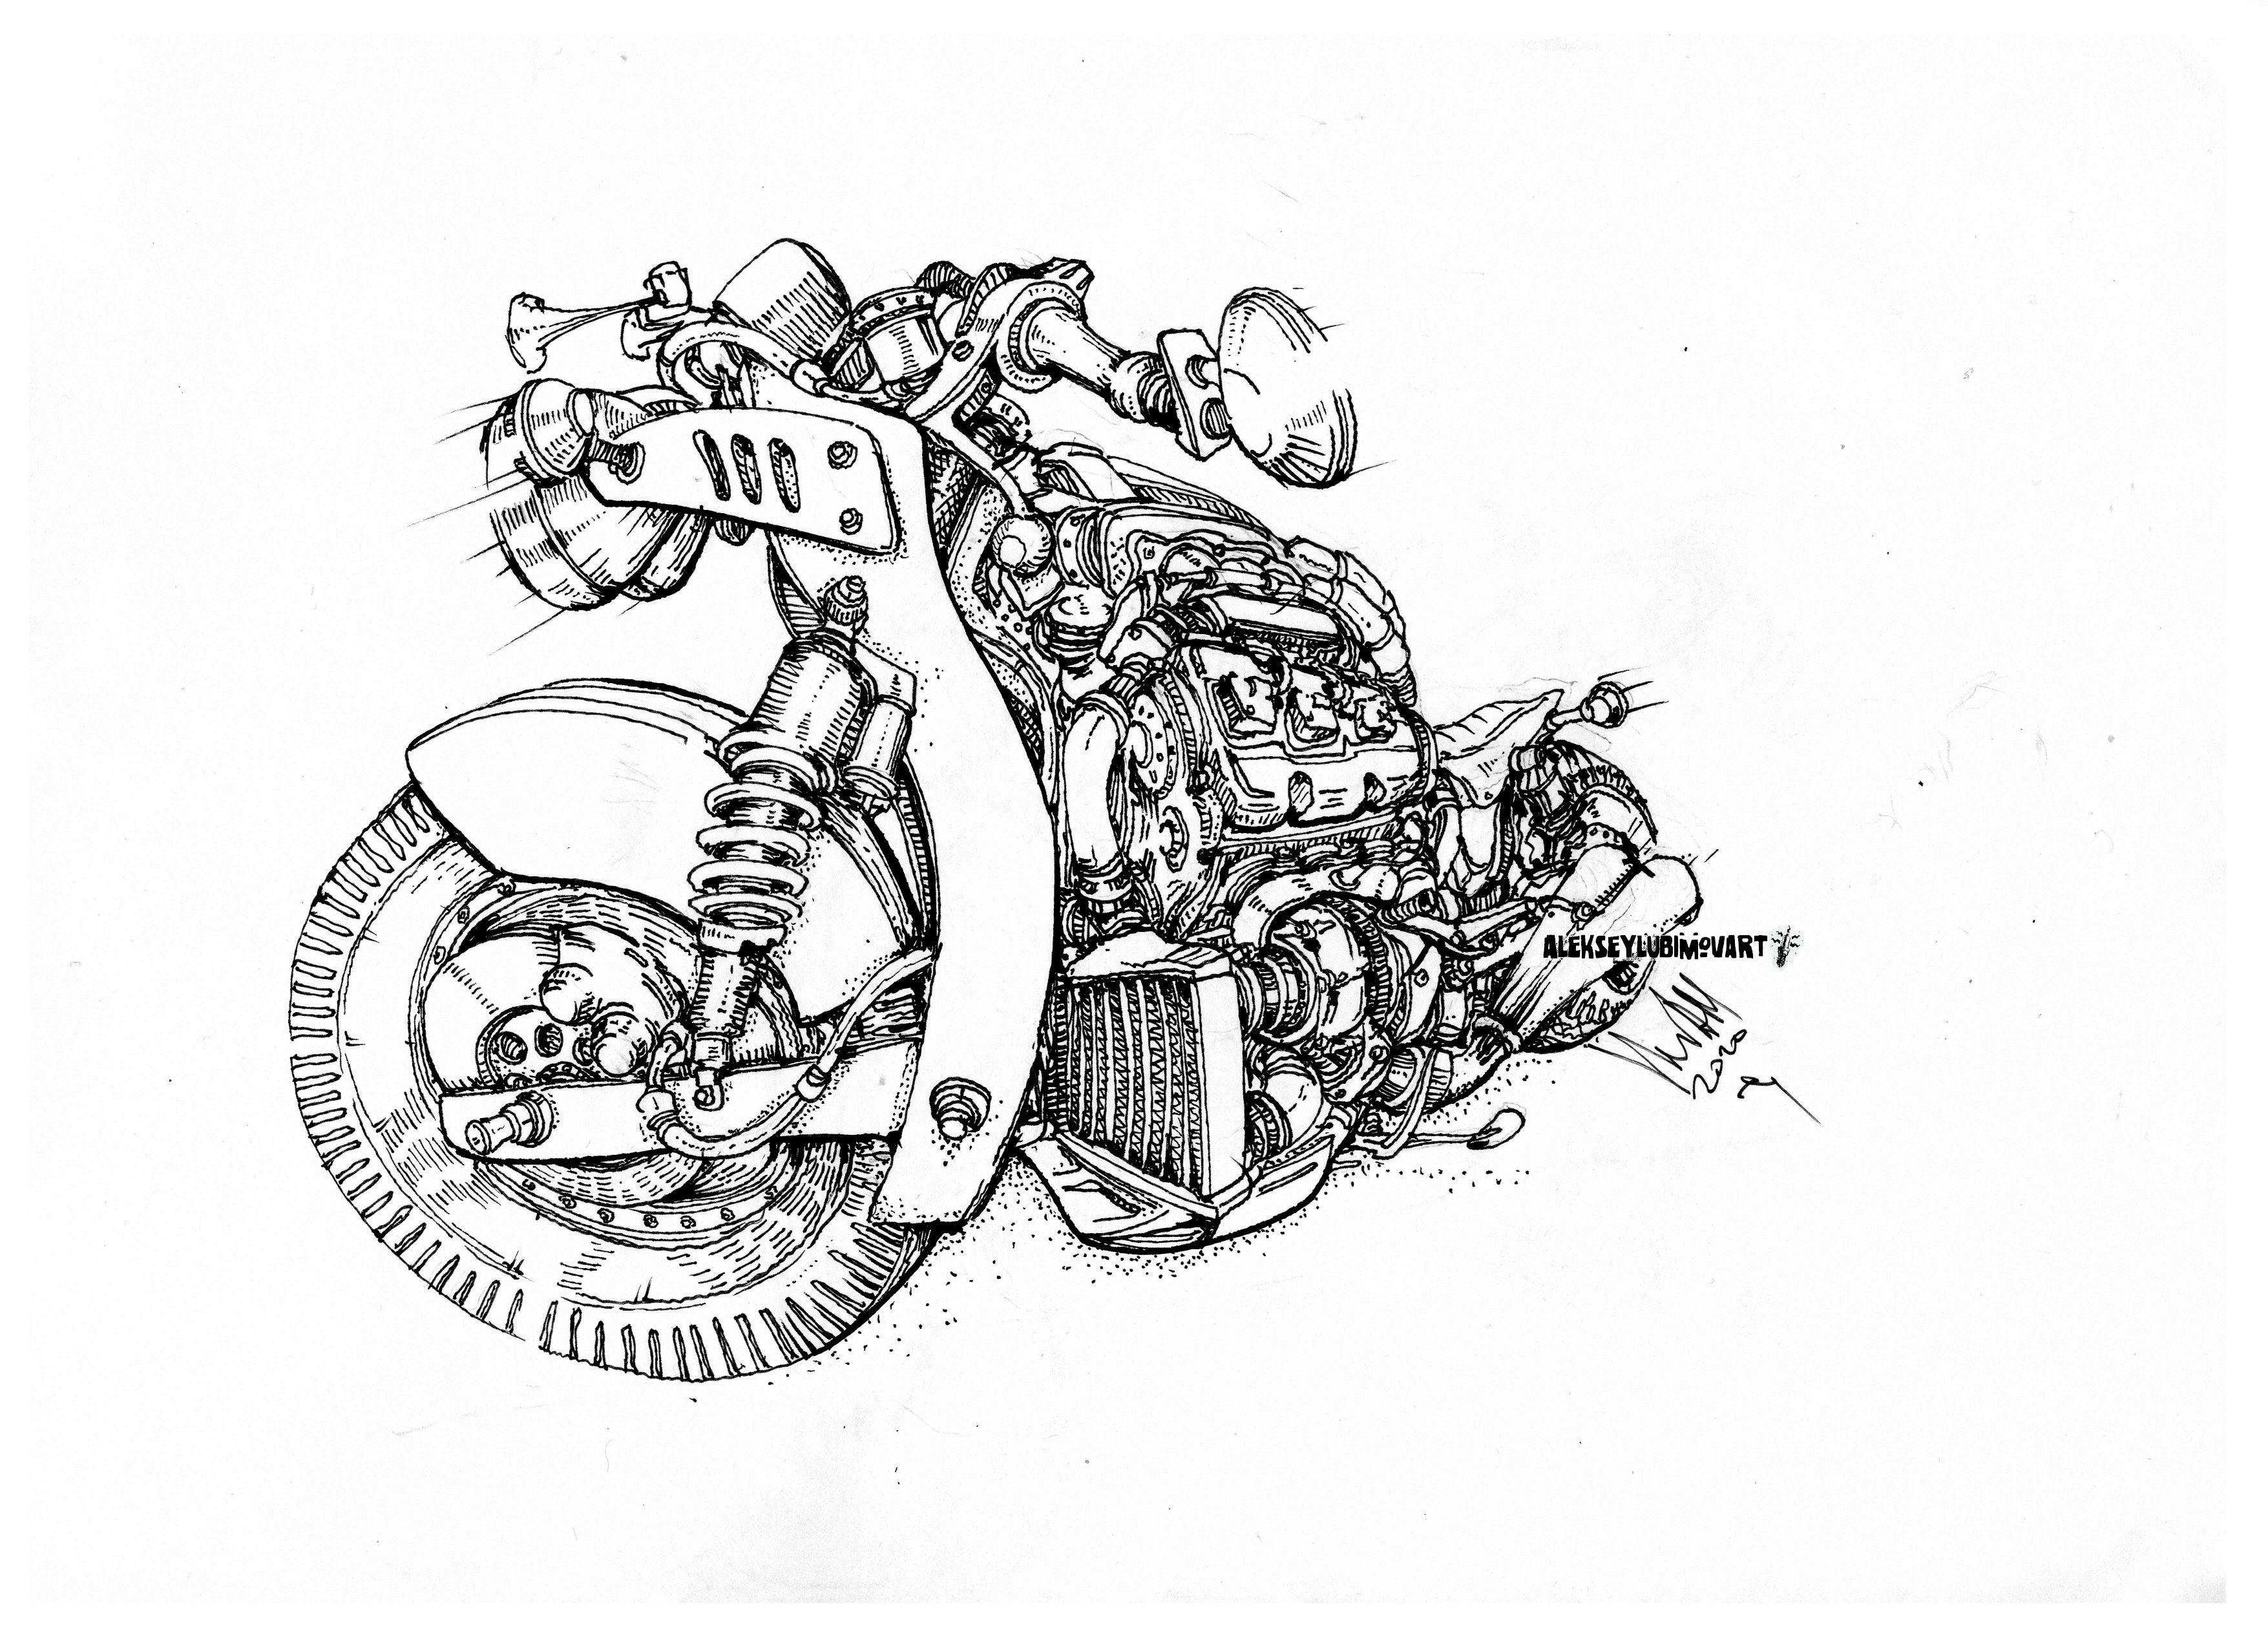 Author Aleksey Lubimov  #cardrawings #turbo  #alekseylubimov_art #алексейлюбимовбиомеханика #алексейлюбимов #стимпанк #дизельпанк #биомеханика #marchofrobots #steampunk #dieselpunk #biomechanical #lineart #inking #motor #inktober2020 #technodoodling